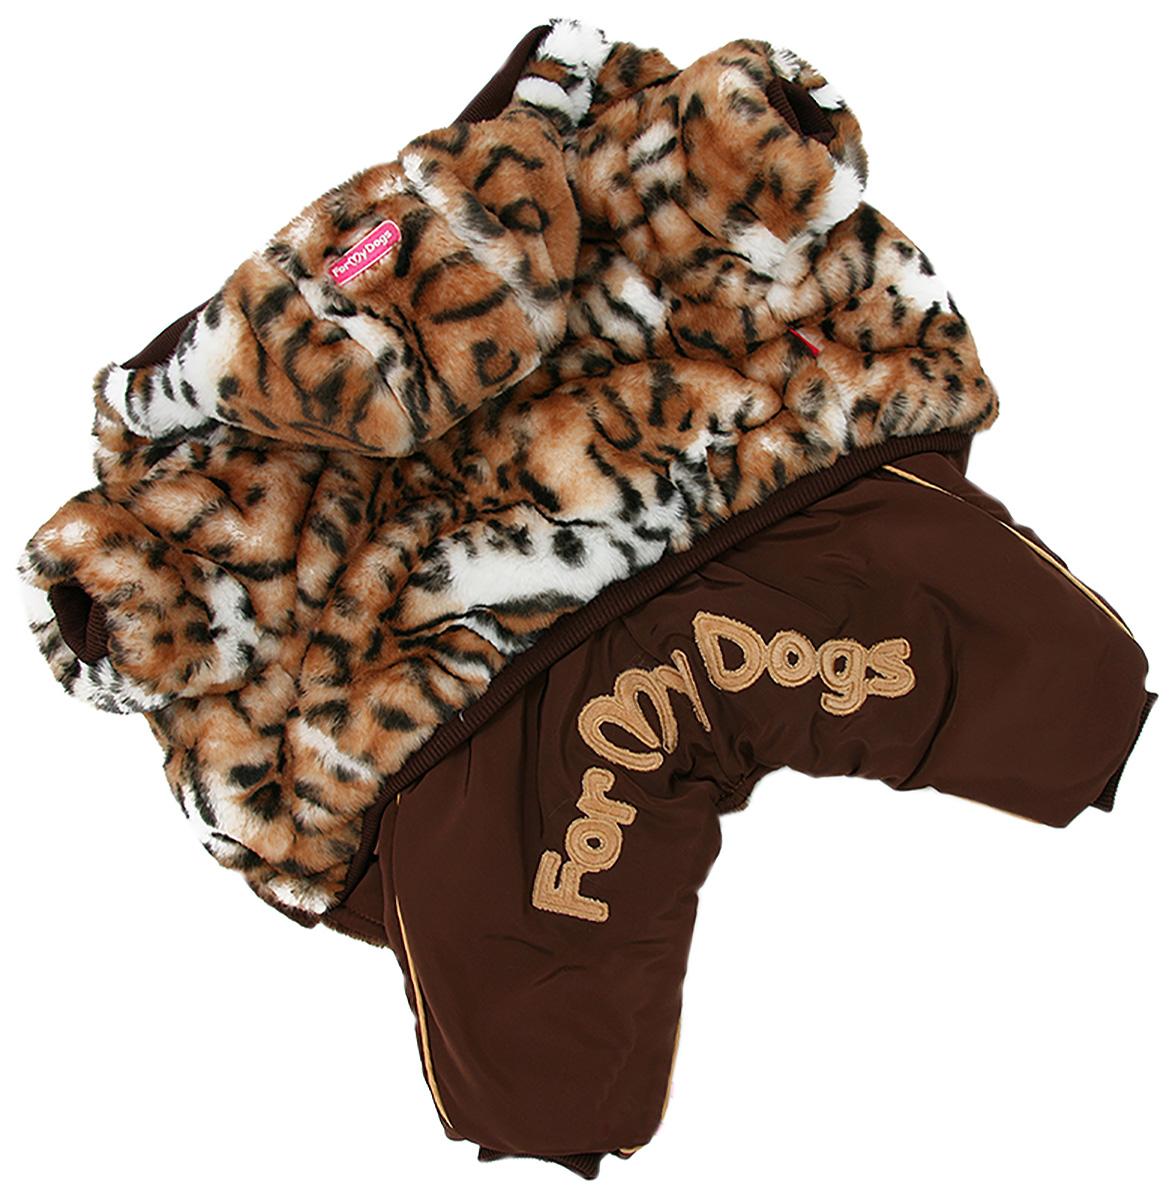 For My Dogs комбинезон-шубка для собак коричневый для девочек Fw927-2020 F (12Chh)